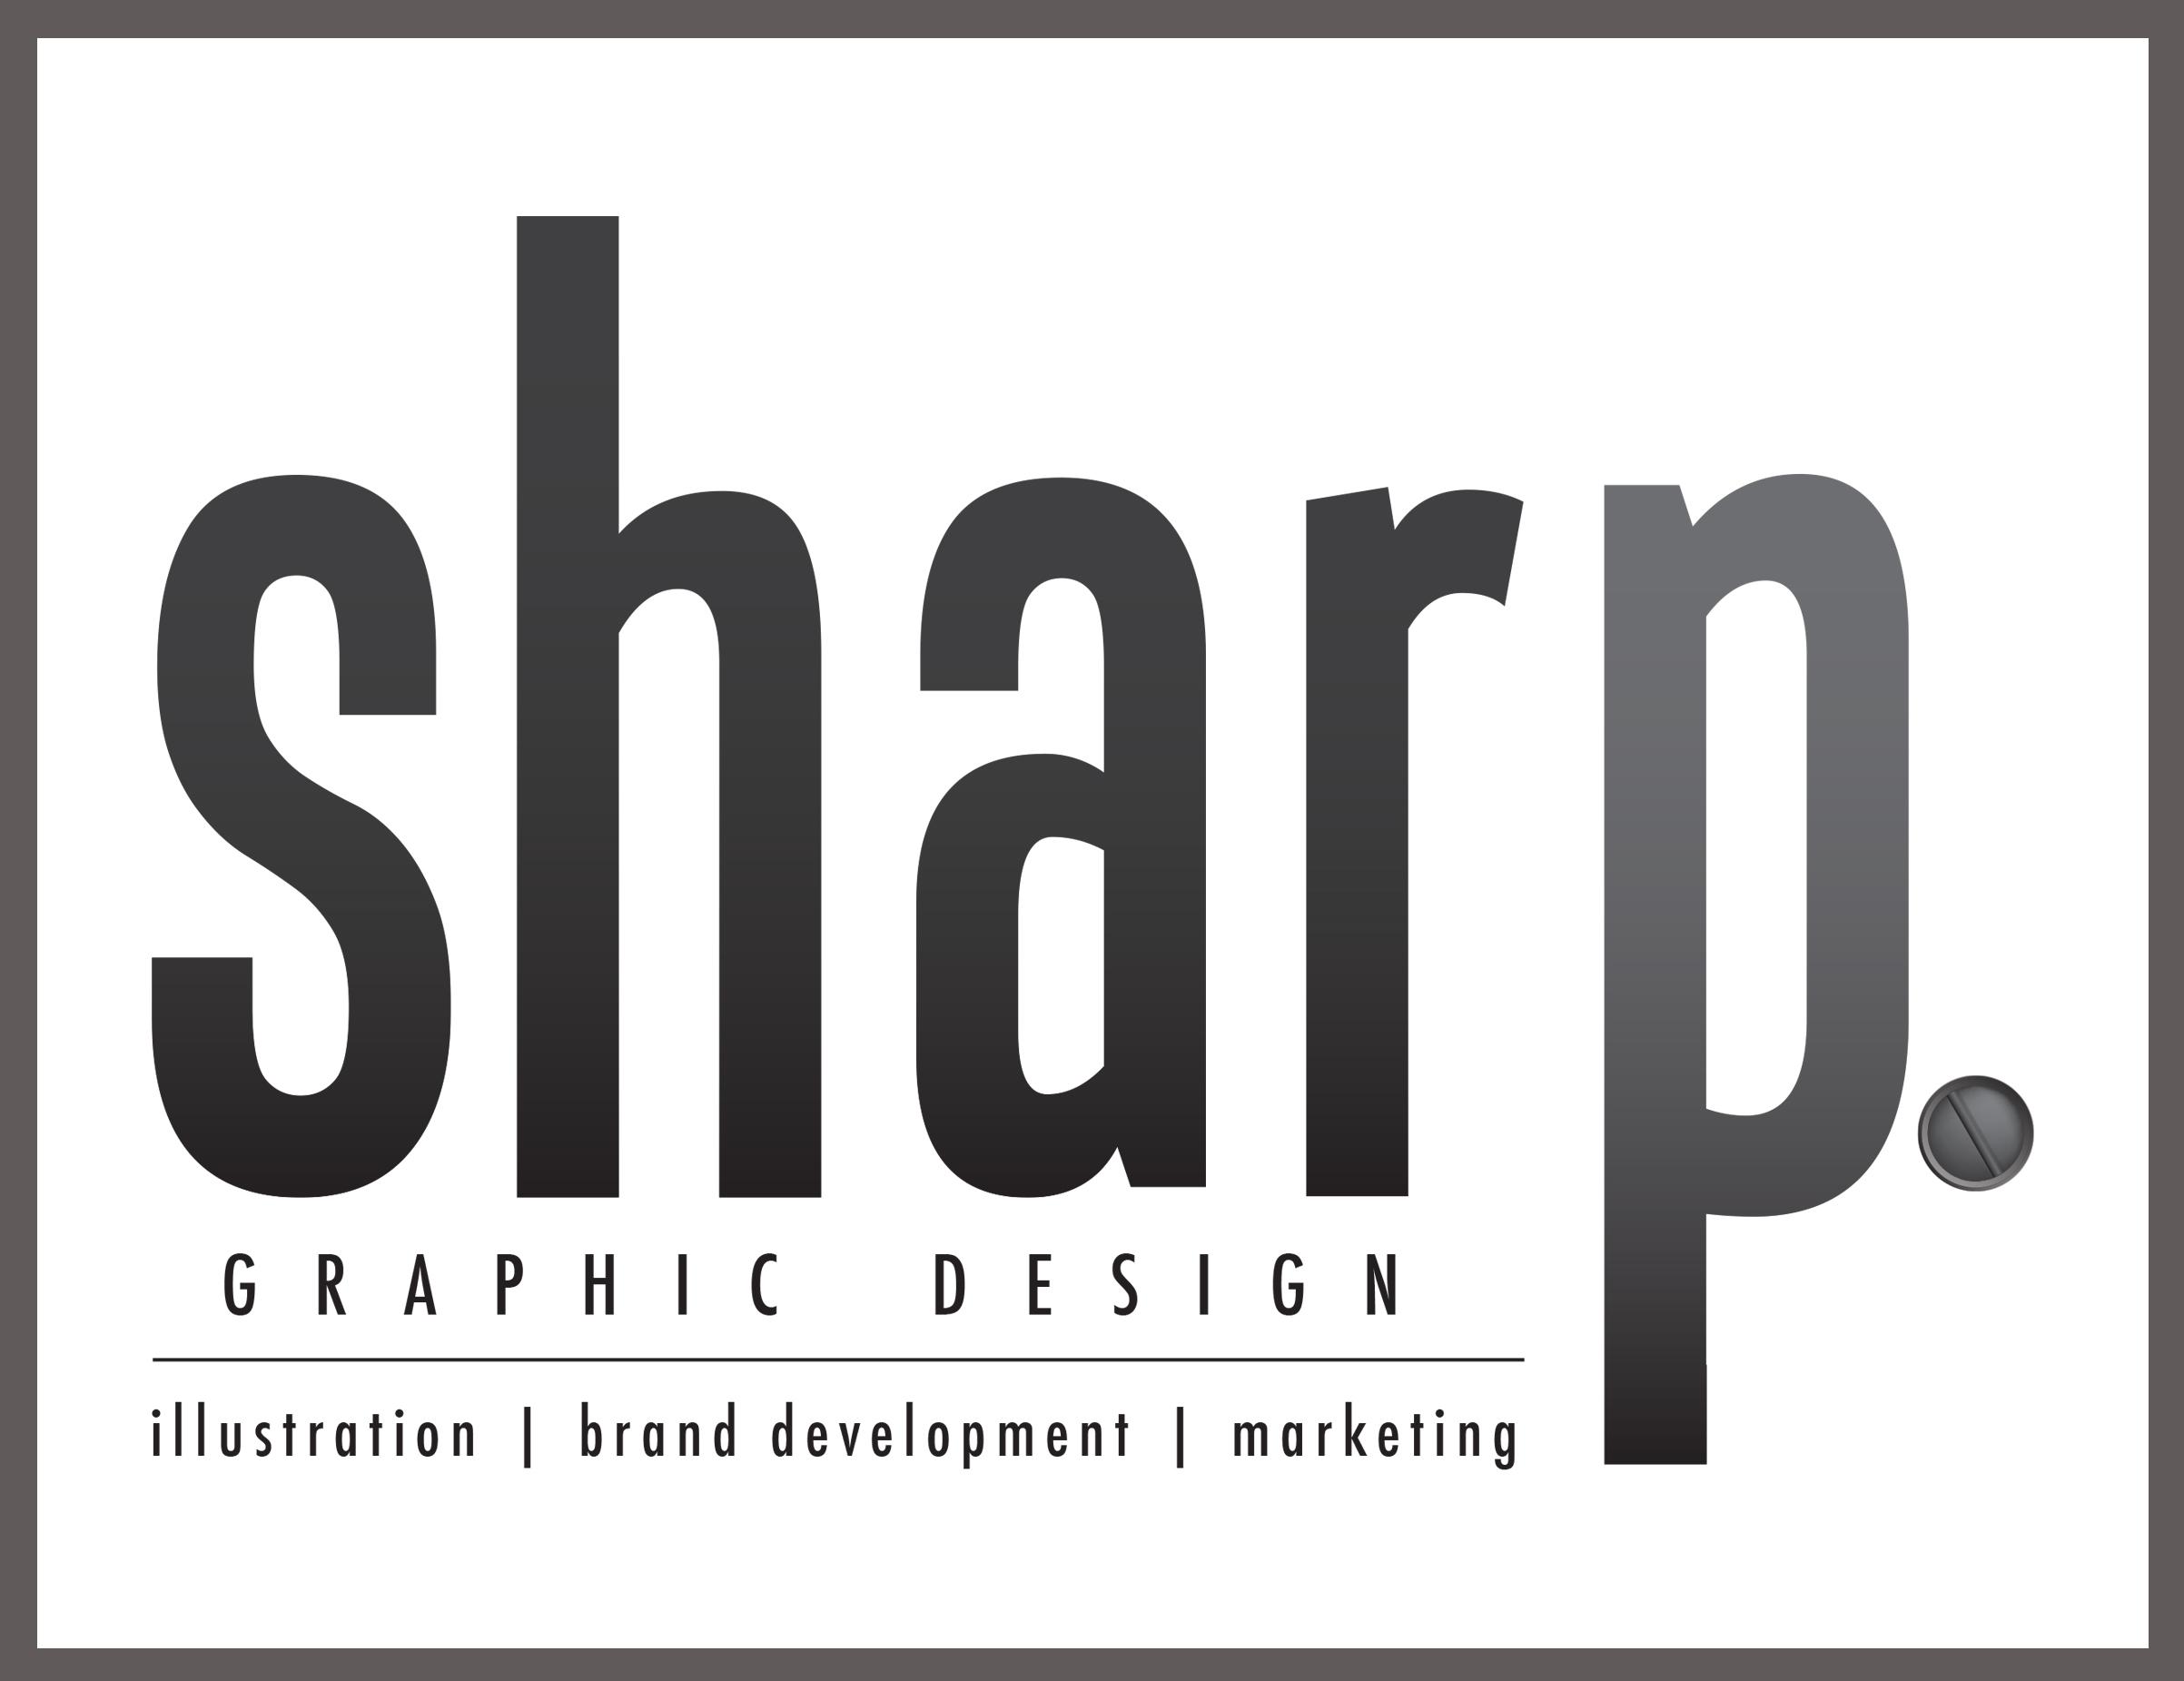 Sharp Graphic Design A Fresh Take On Creative